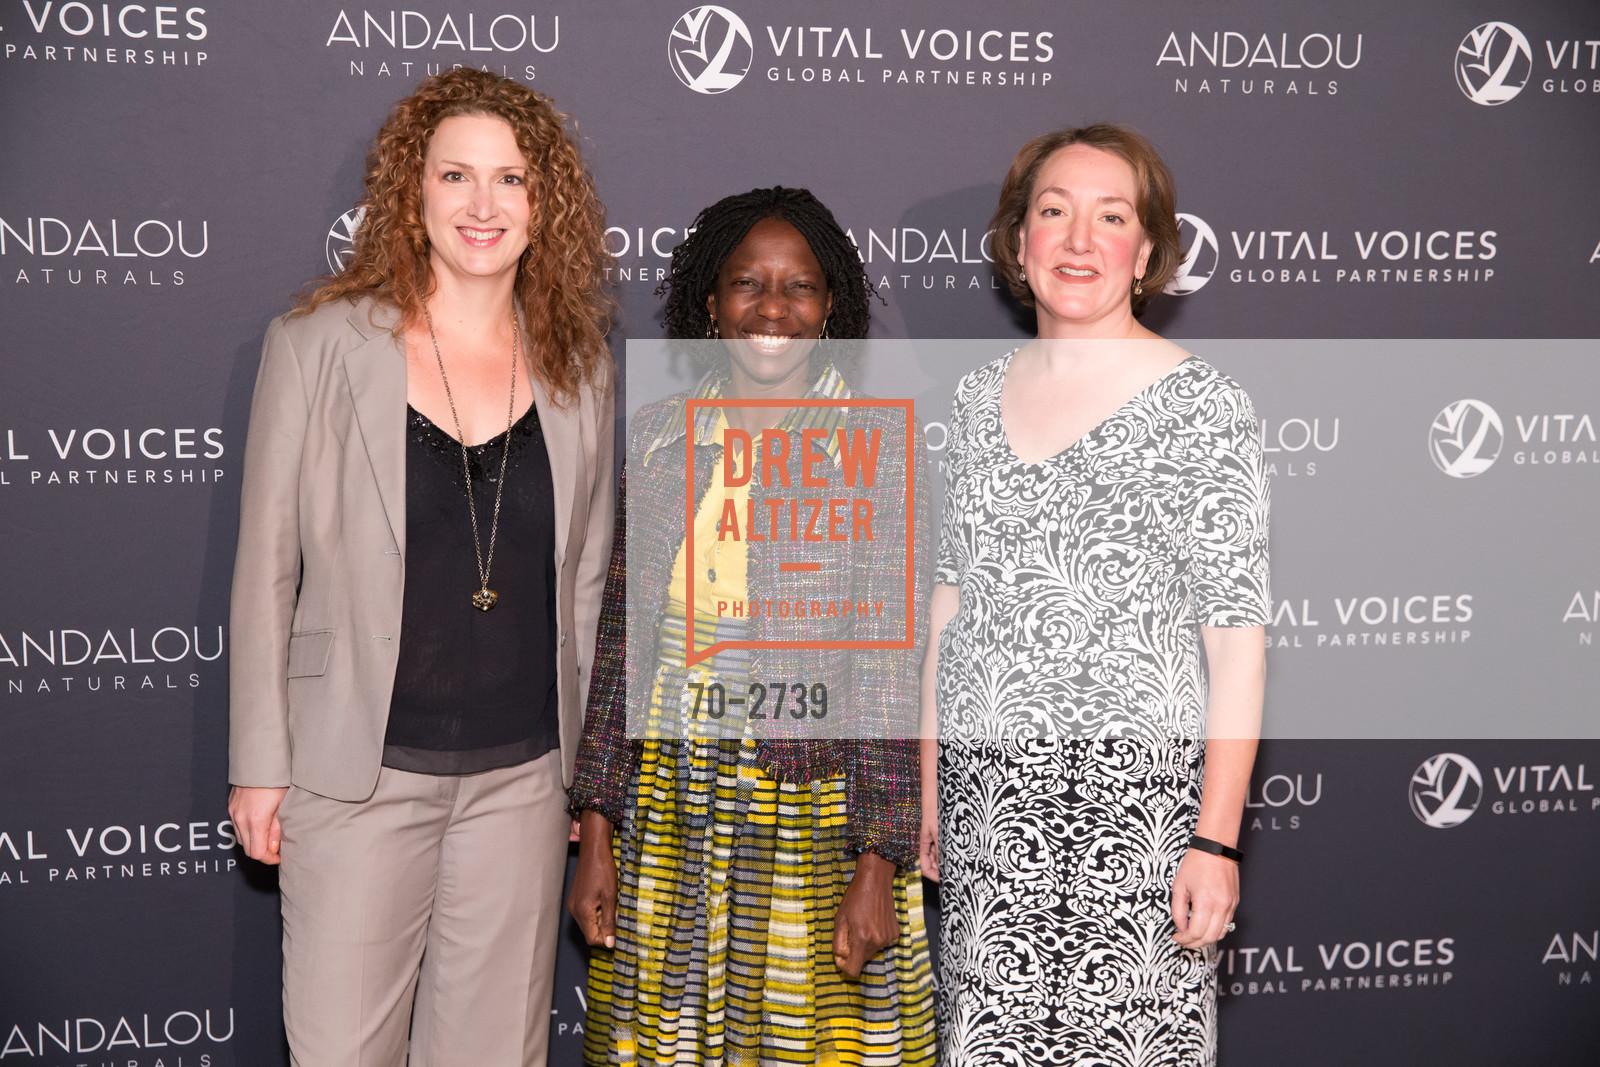 Jessica Hubley, Agnes Igoye, Heather King, Photo #70-2739